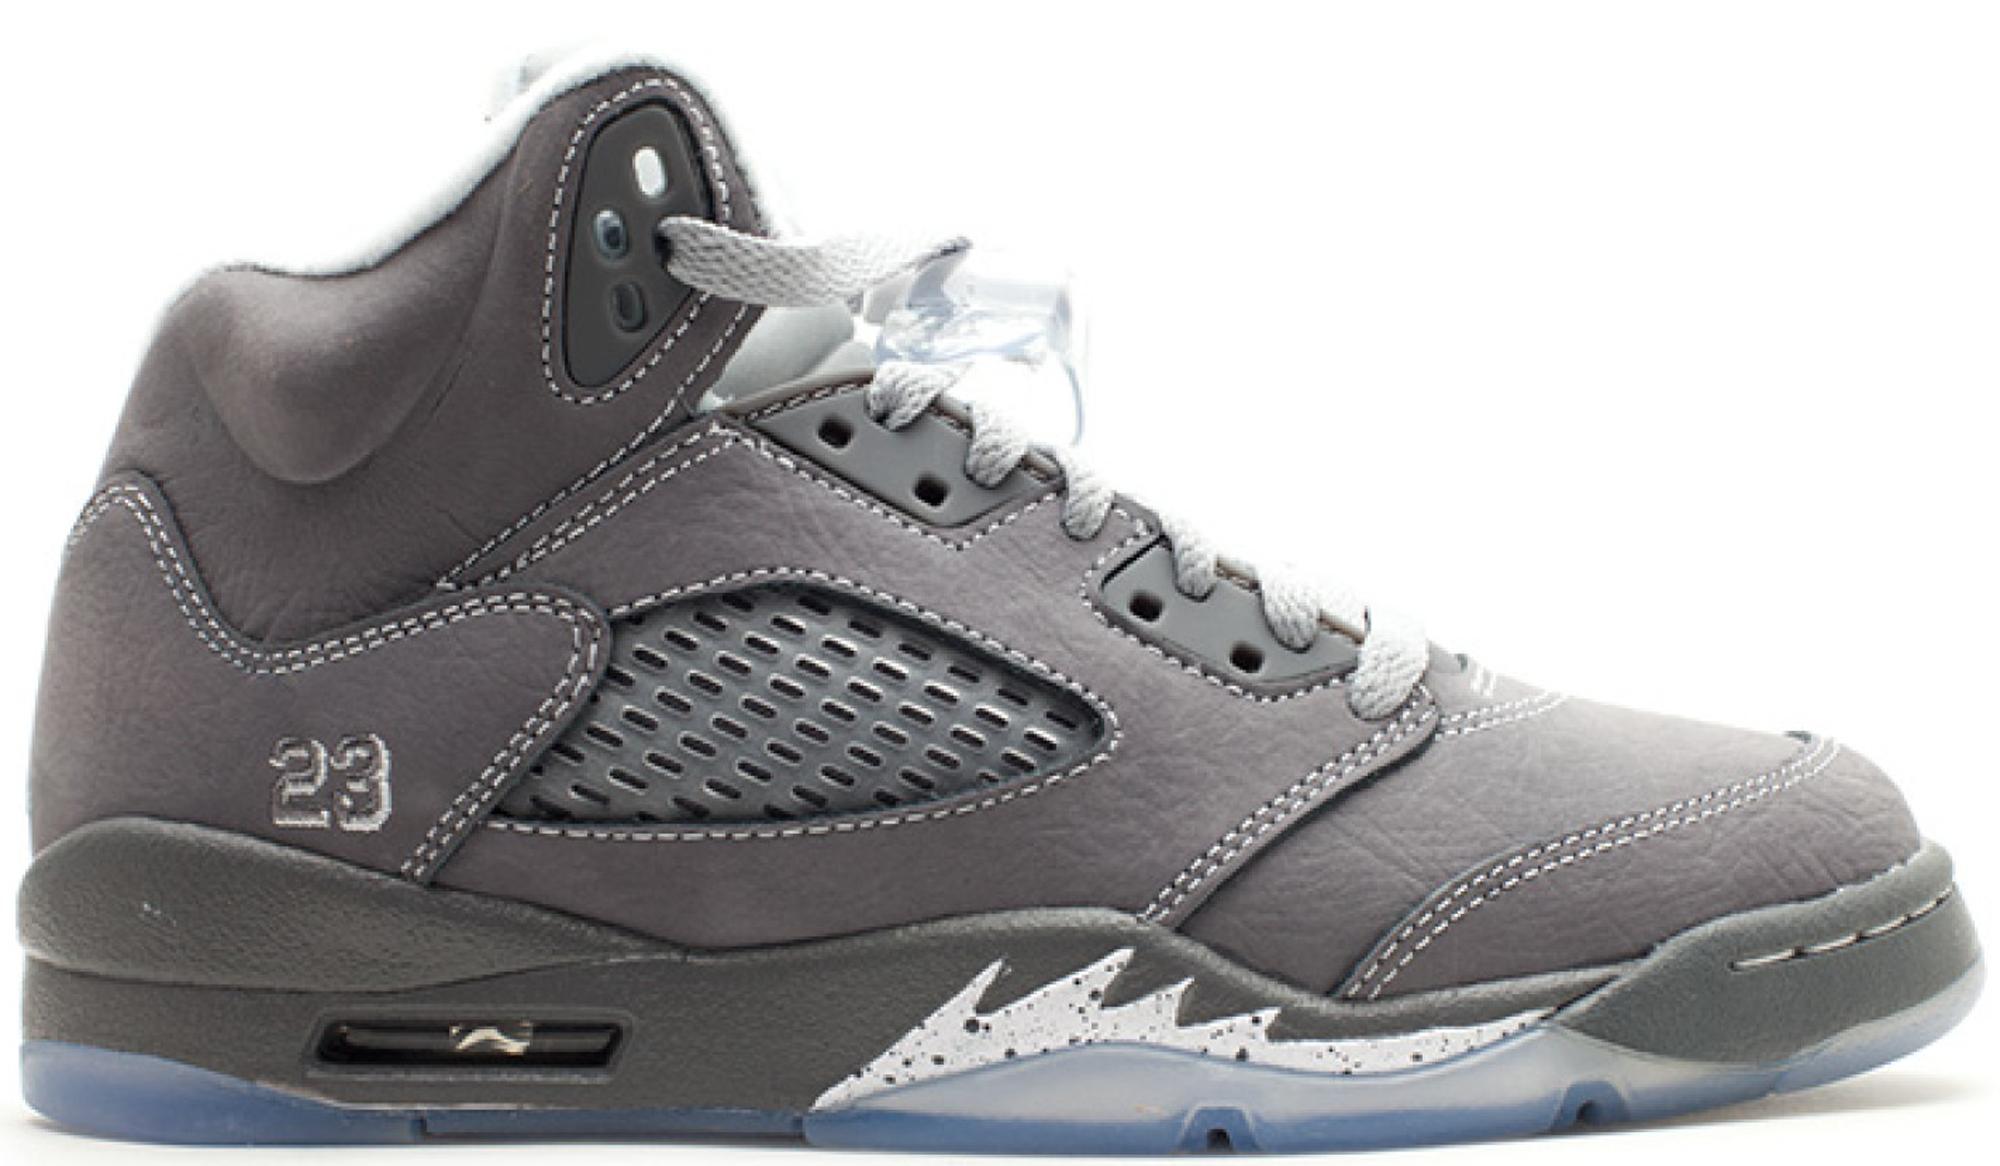 Jordan 5 Retro Wolf Grey 2011 (GS